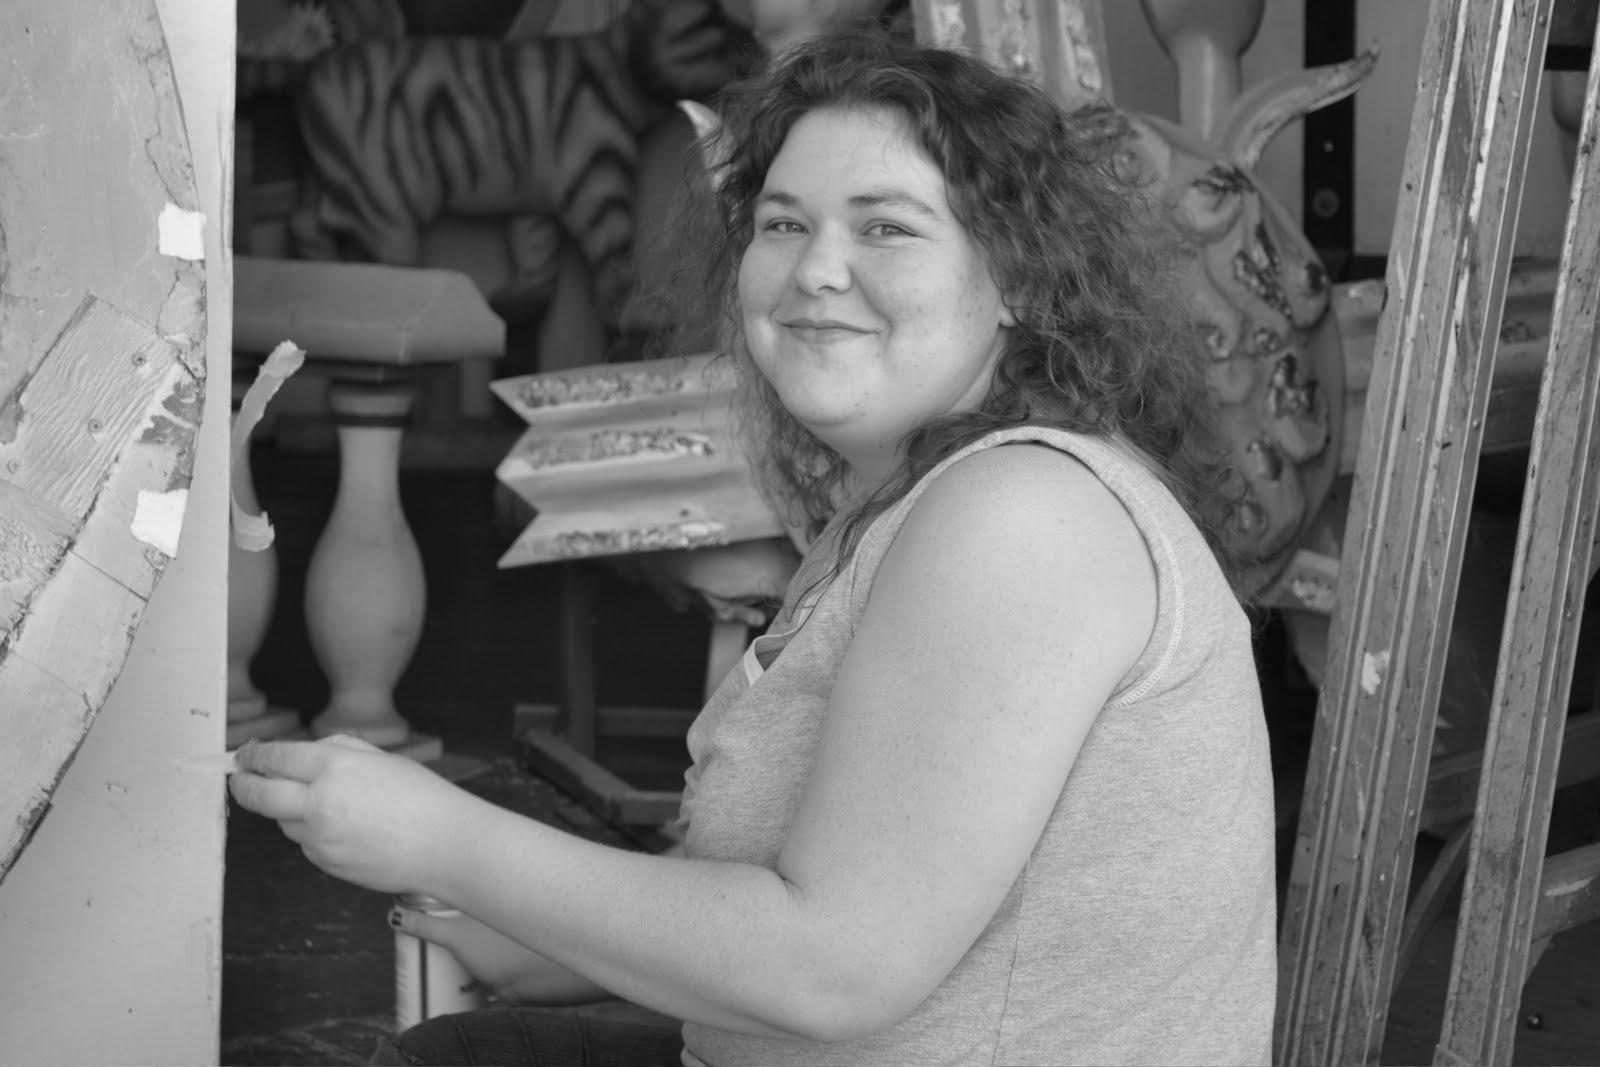 An artist at Blaine Kern's Mardi Gras World